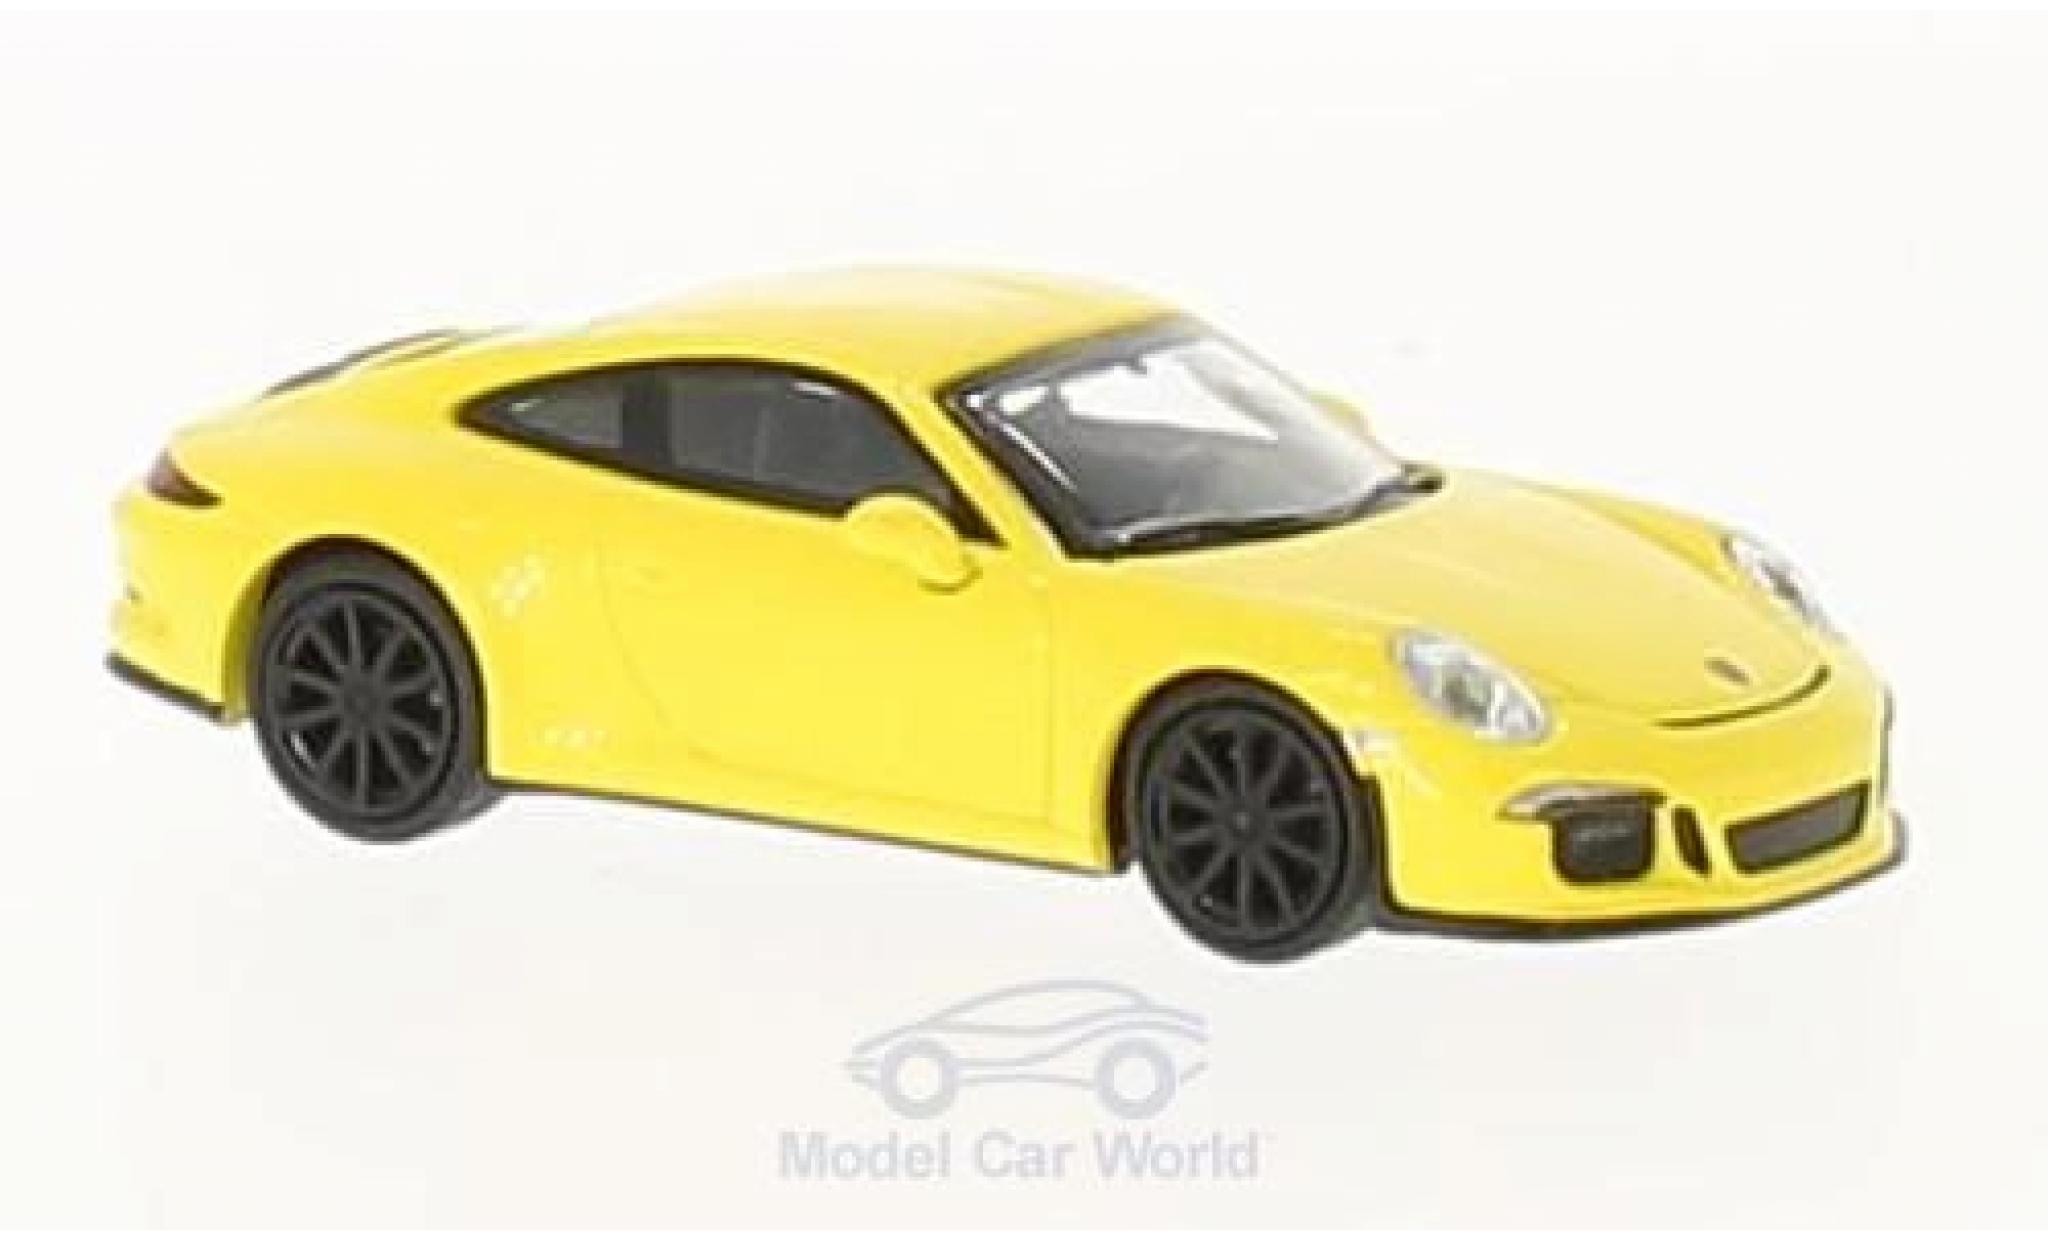 Porsche 991 SC 1/87 Minichamps R jaune 2016 mit noireen Felgen